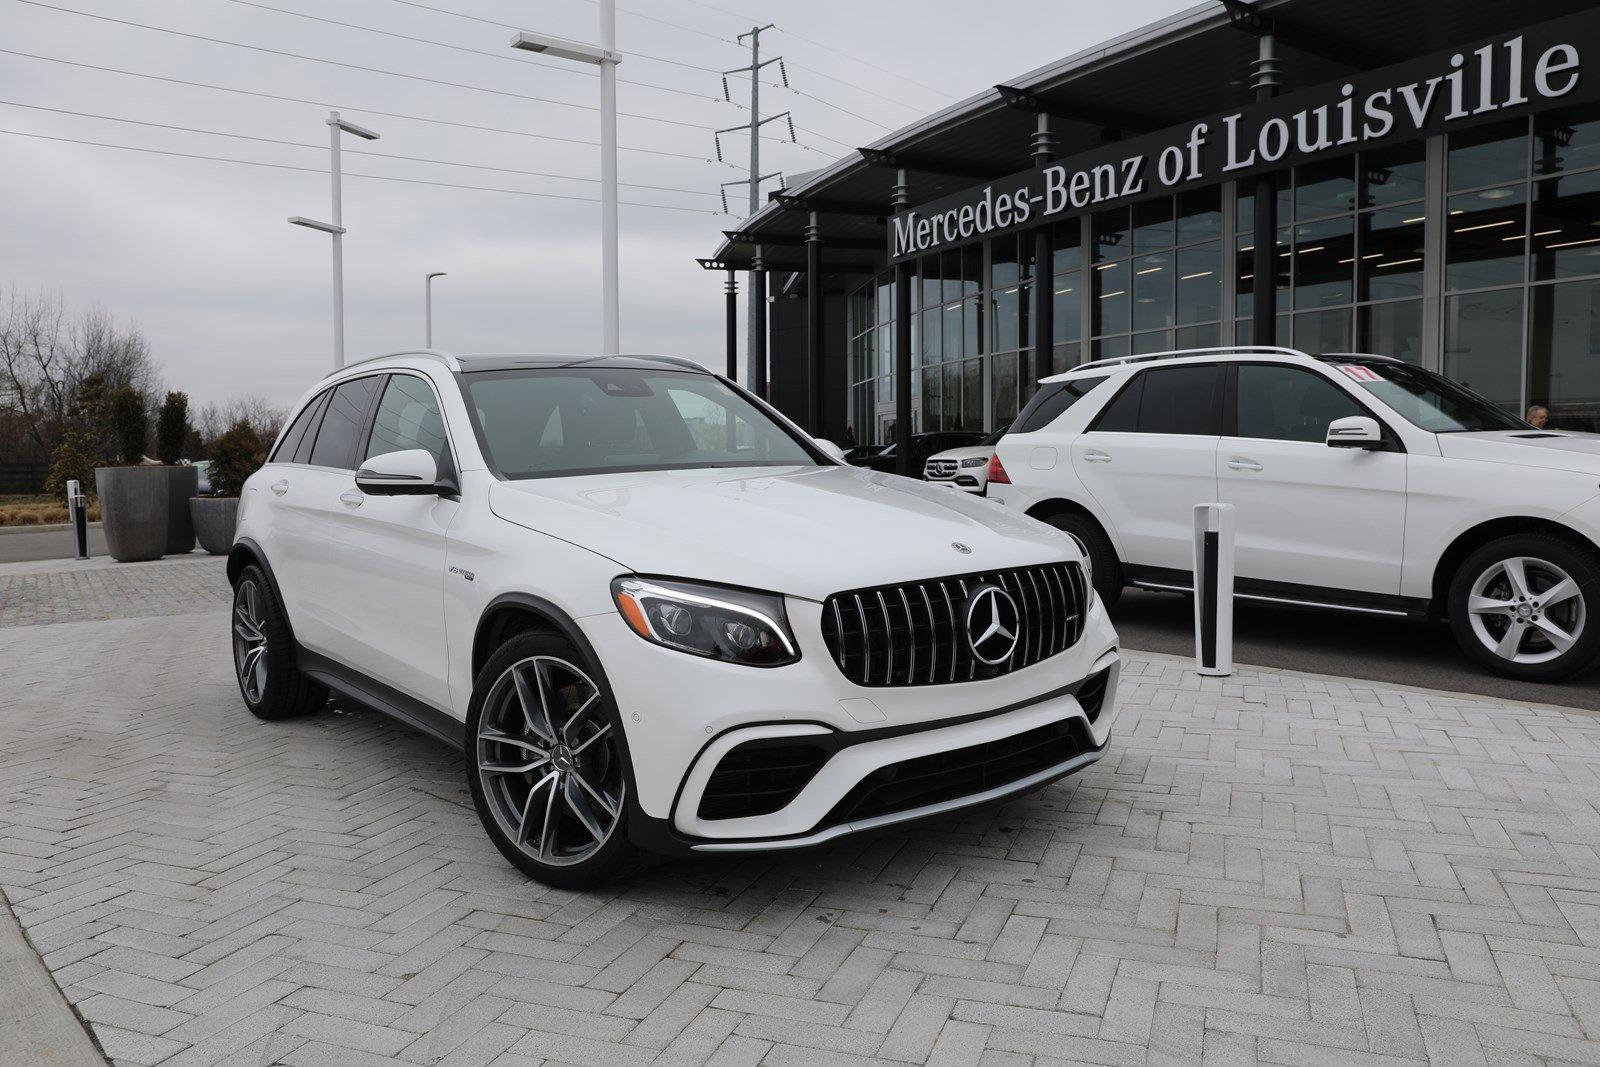 Pre-Owned 2019 Mercedes-Benz GLC AMG® GLC 63 4MATIC® SUV